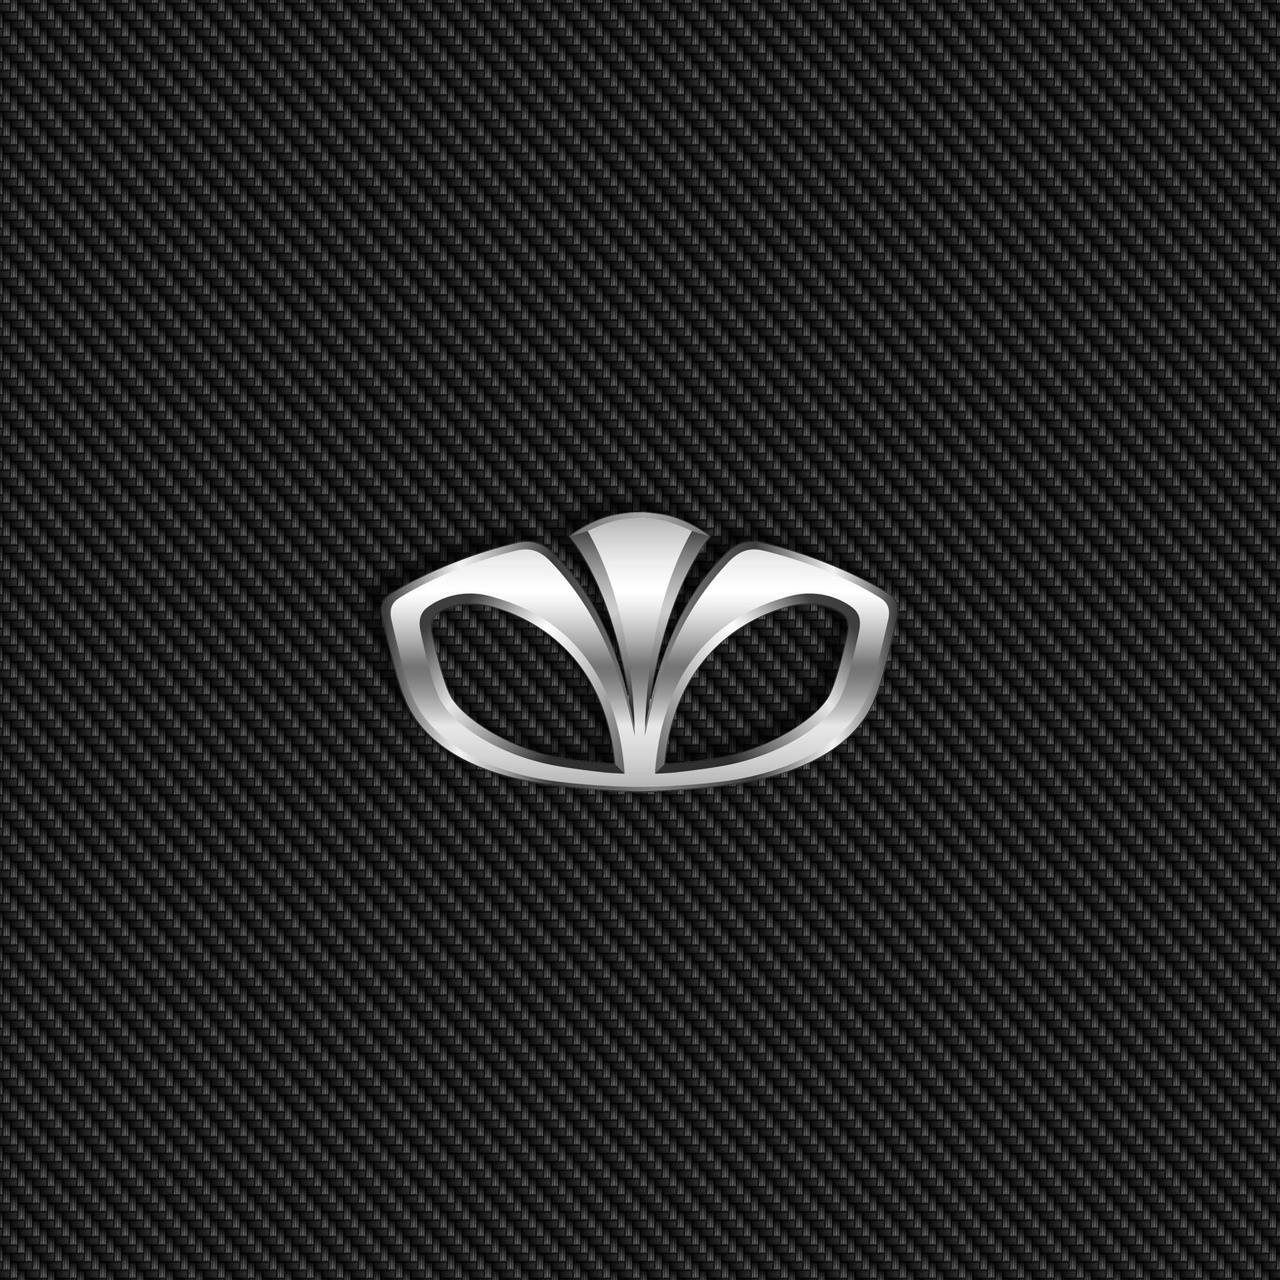 Daewoo Carbon